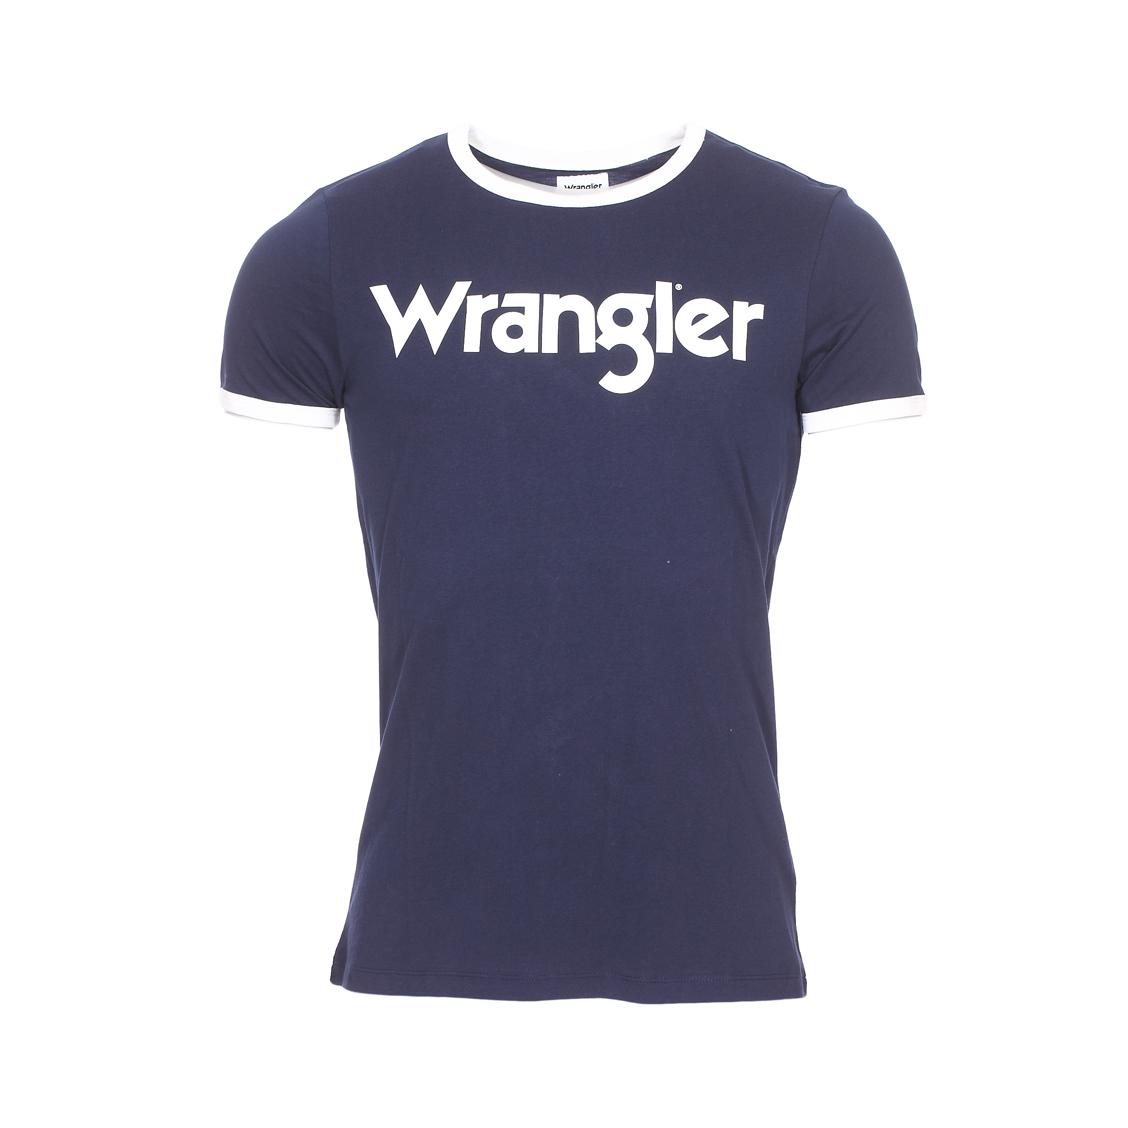 Tee-shirt col rond  kabel en coton bleu marine floqué en blanc